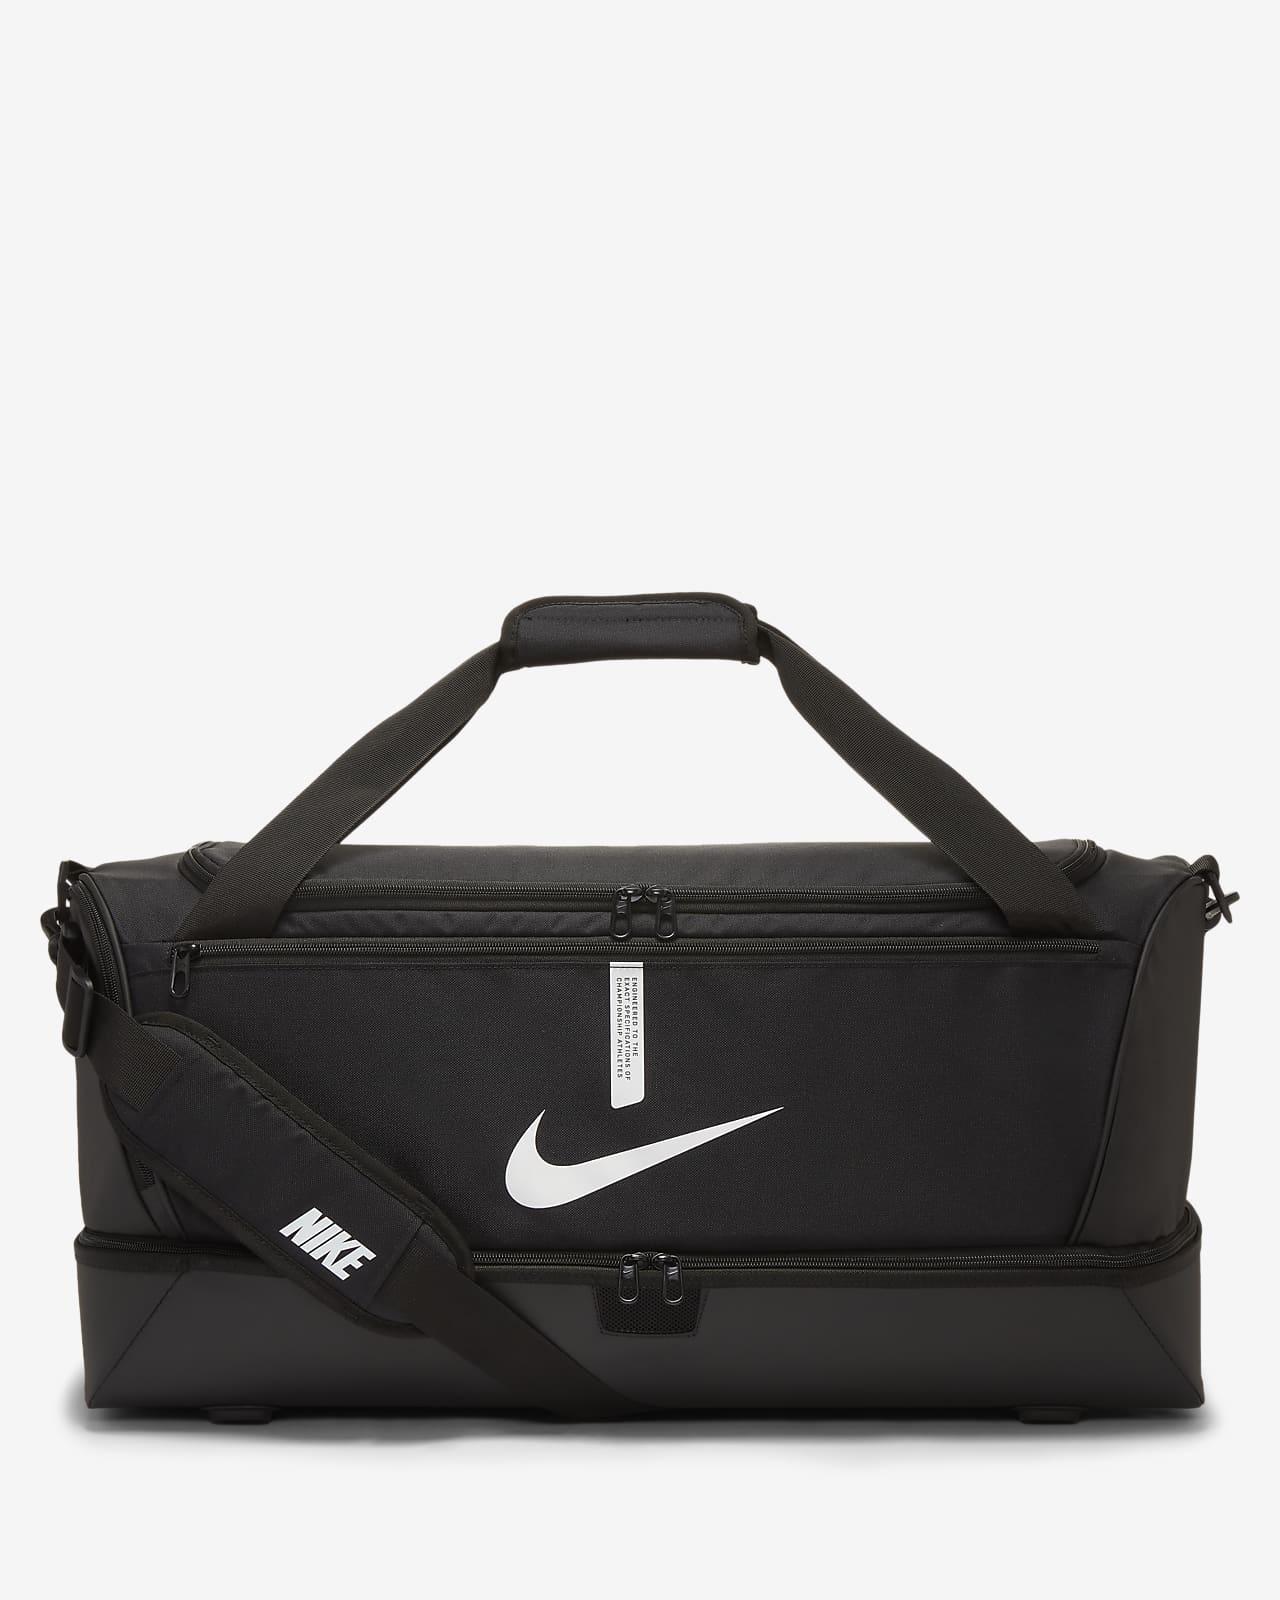 Sac de football rigide Nike Academy Team (grande taille)